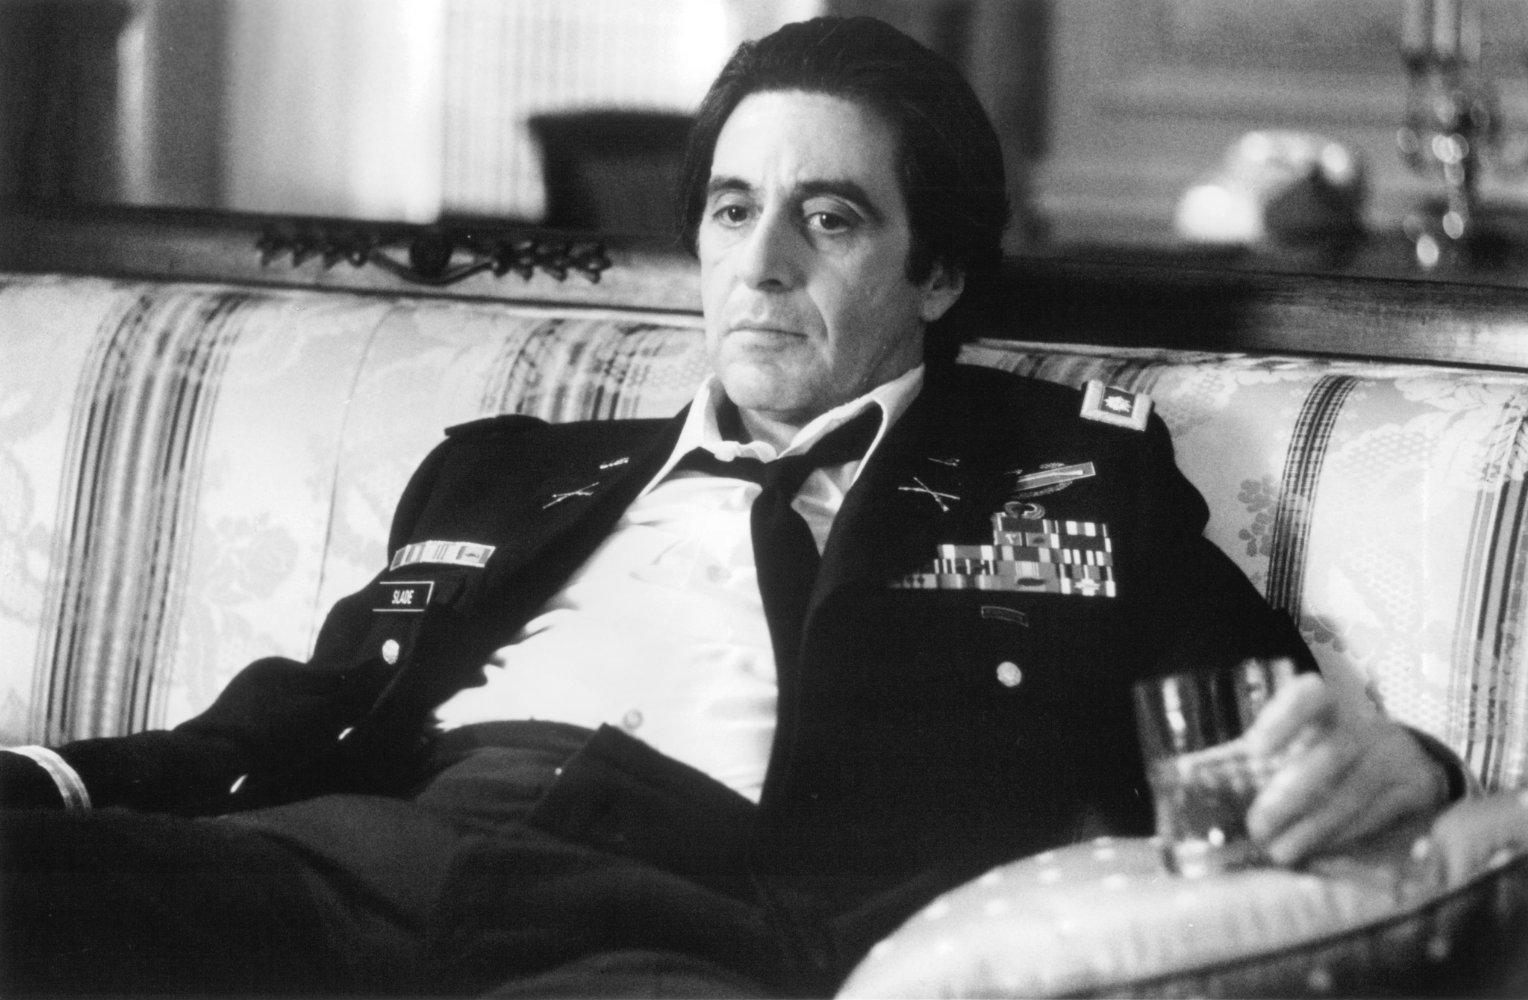 Лучшая мужская роль Оскар 25 лет Аль Пачино Запах женщины 1992